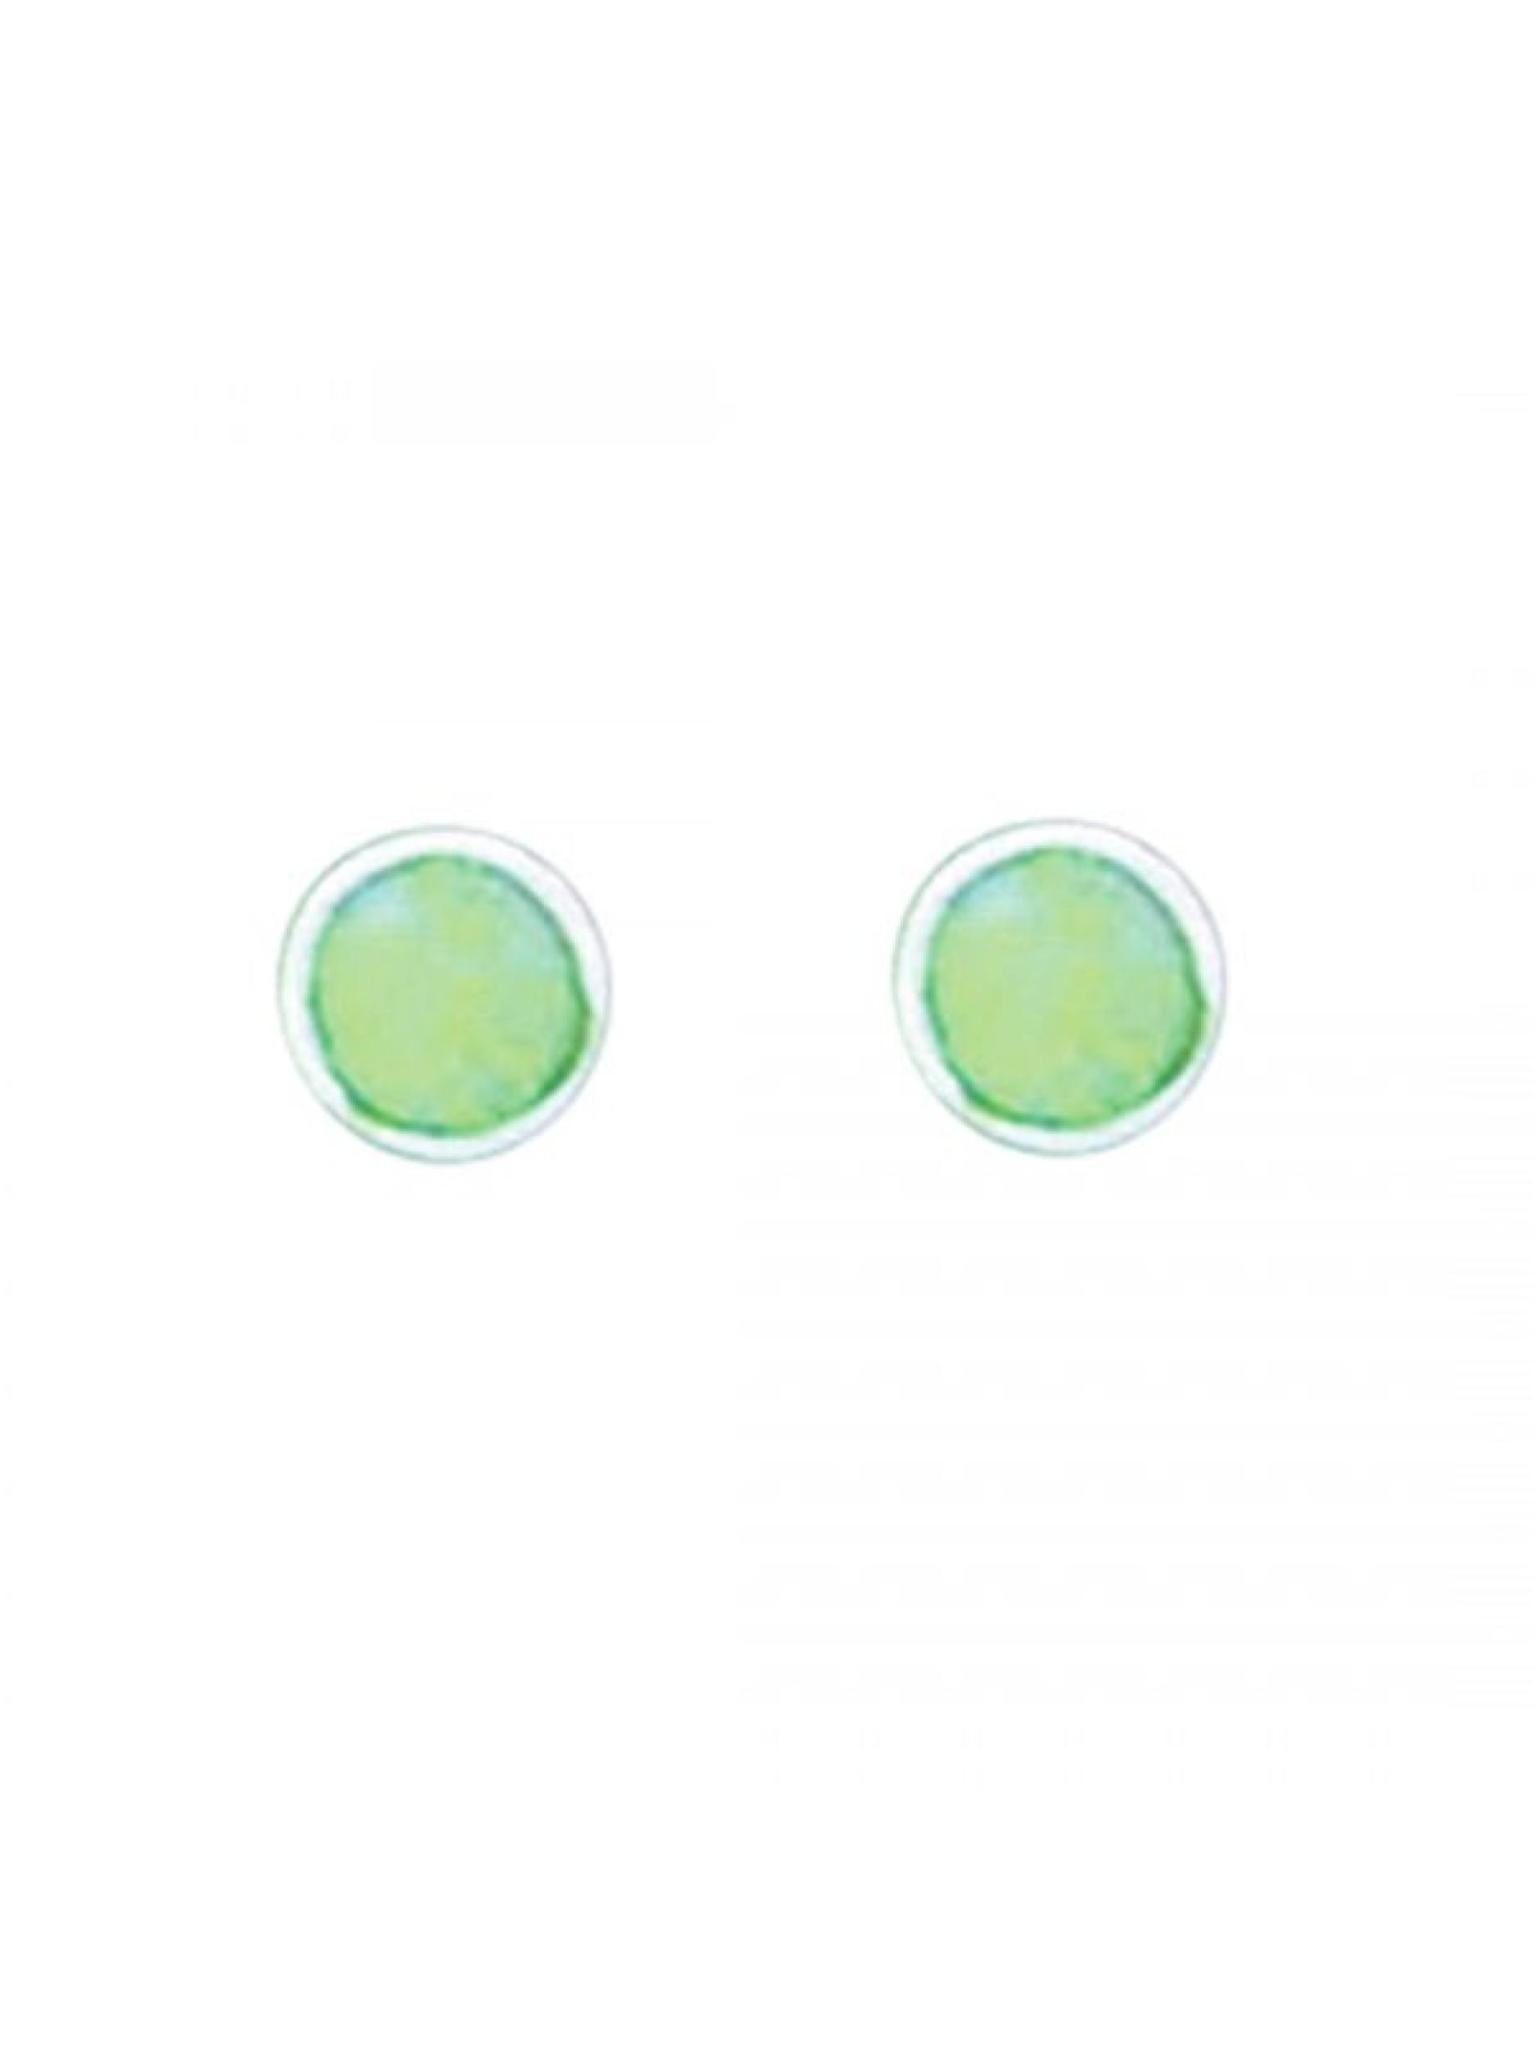 Acomo Jewelry 5mm Round Opal Inlay Stud Earring Opal